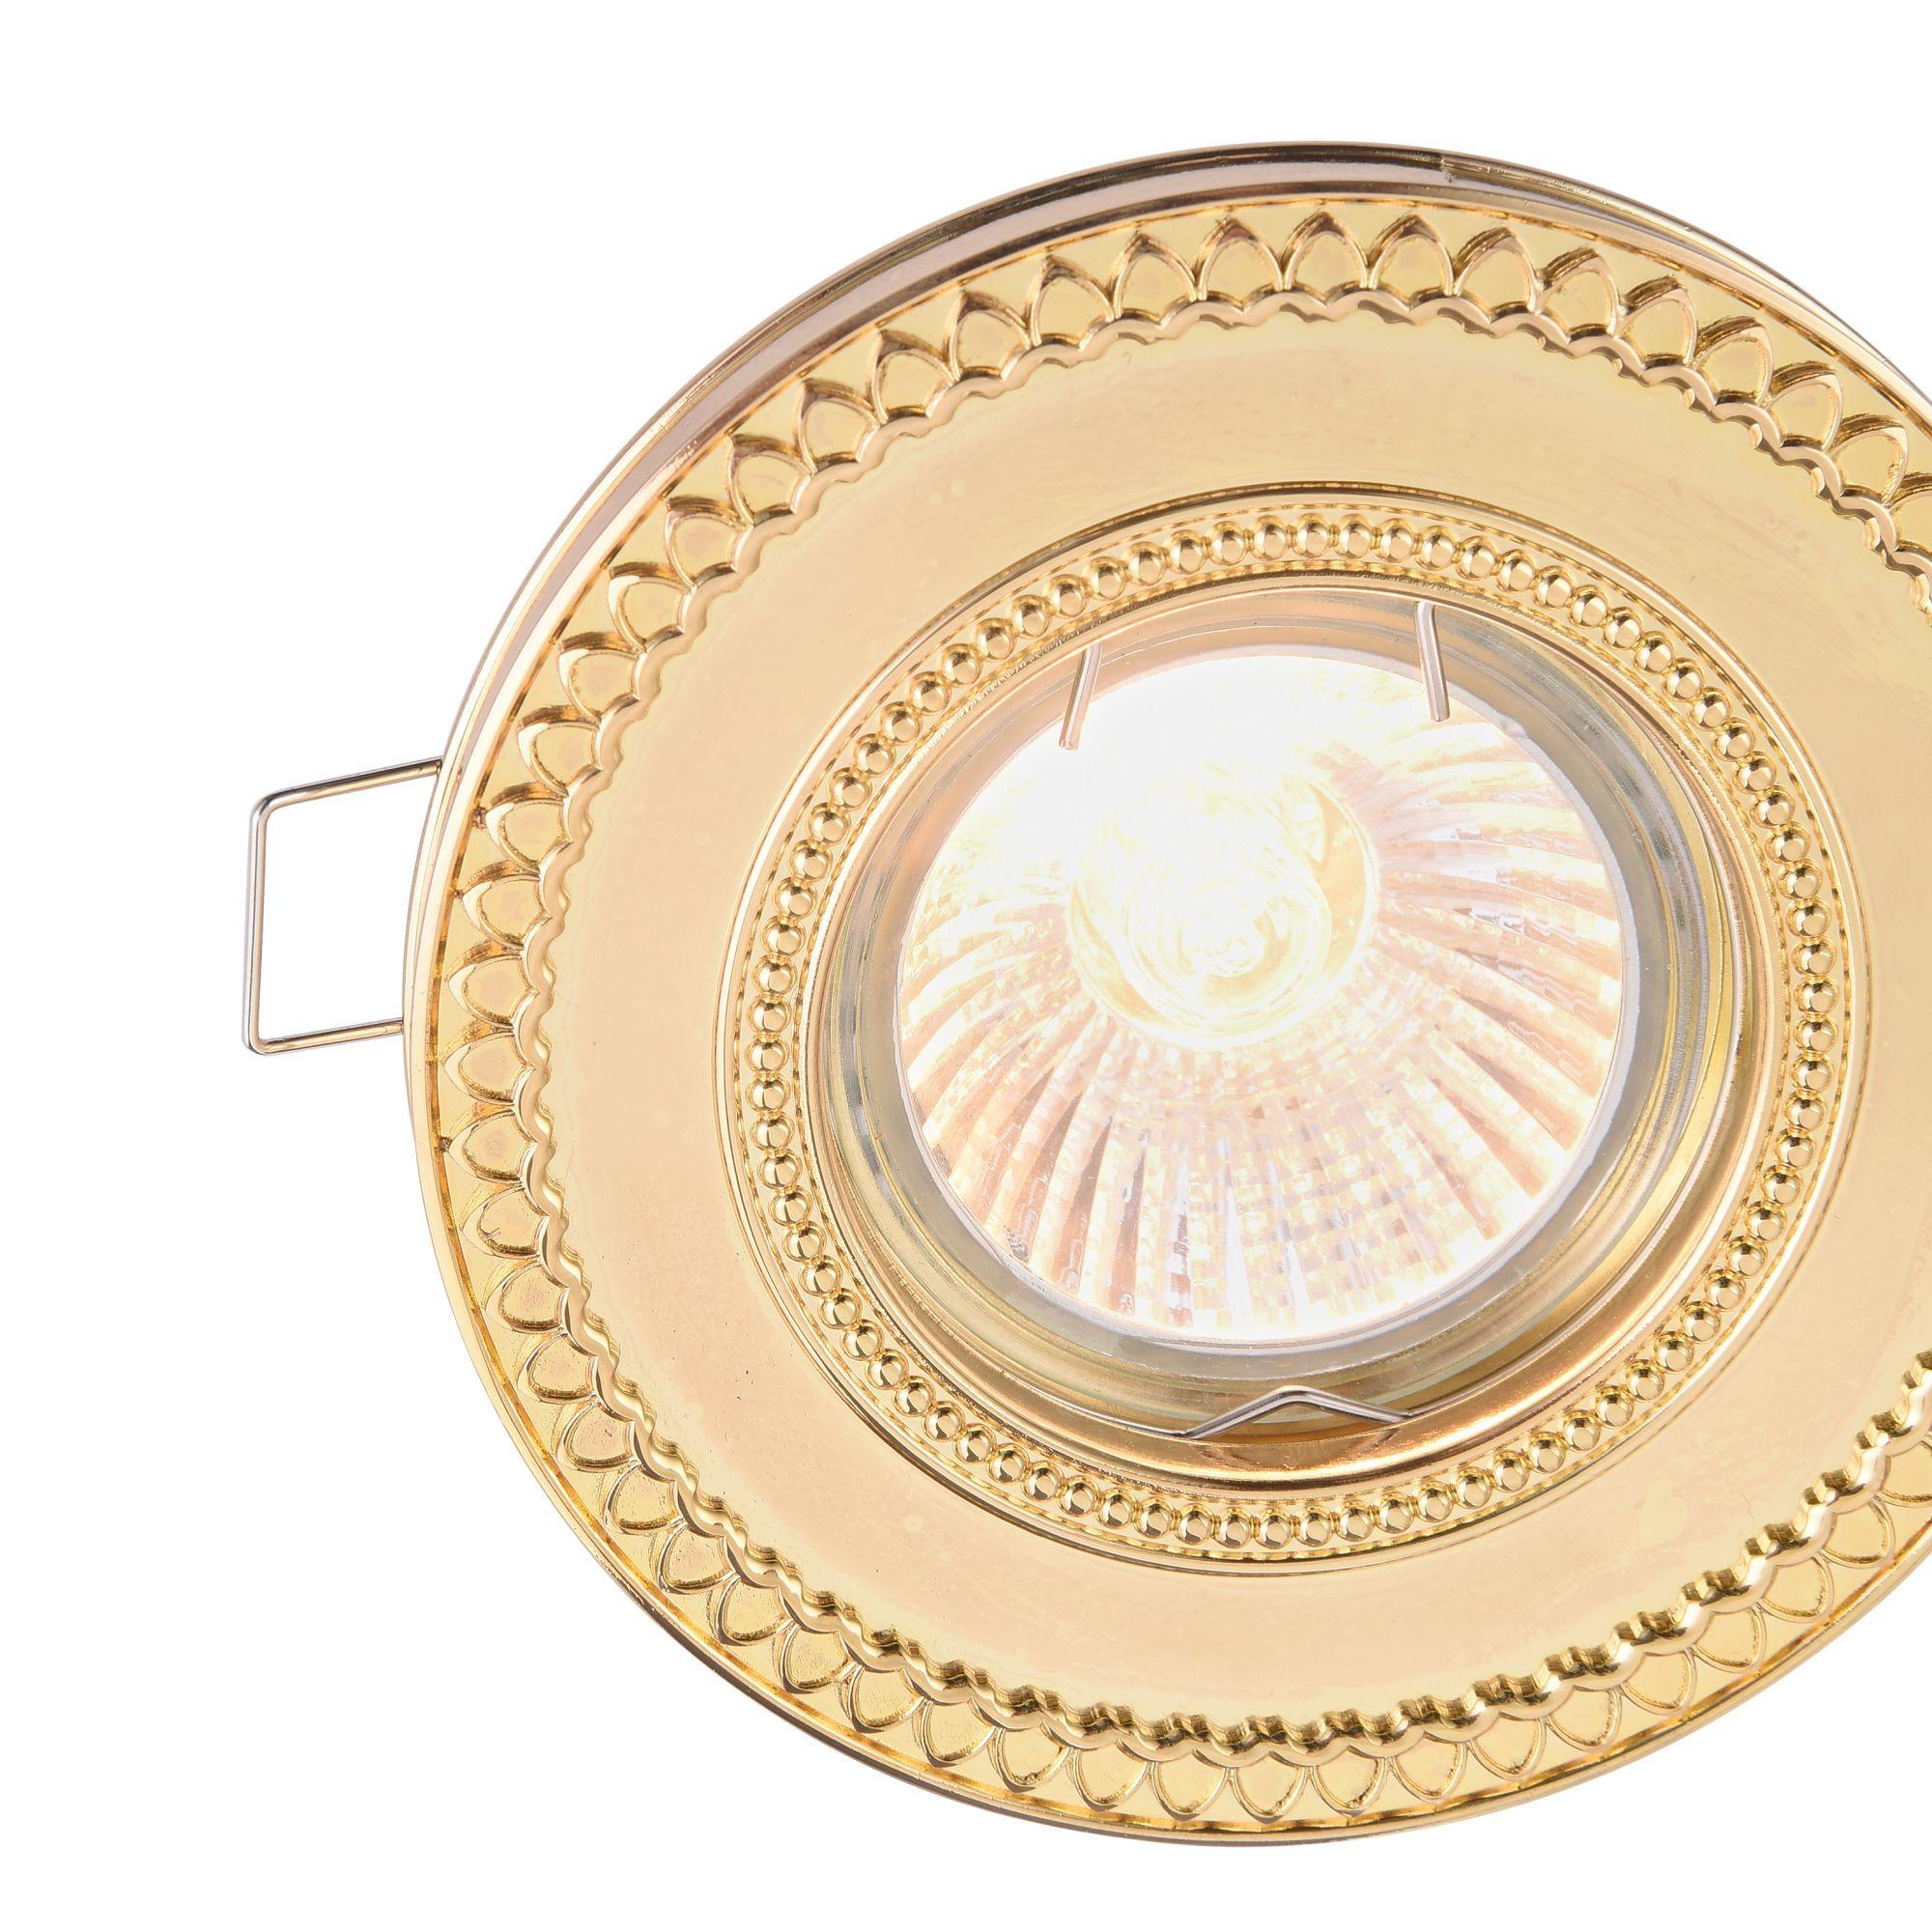 Встраиваемый светильник Maytoni Metal Classic DL302-2-01-G, 1xGU10x50W, золото, металл - фото 7